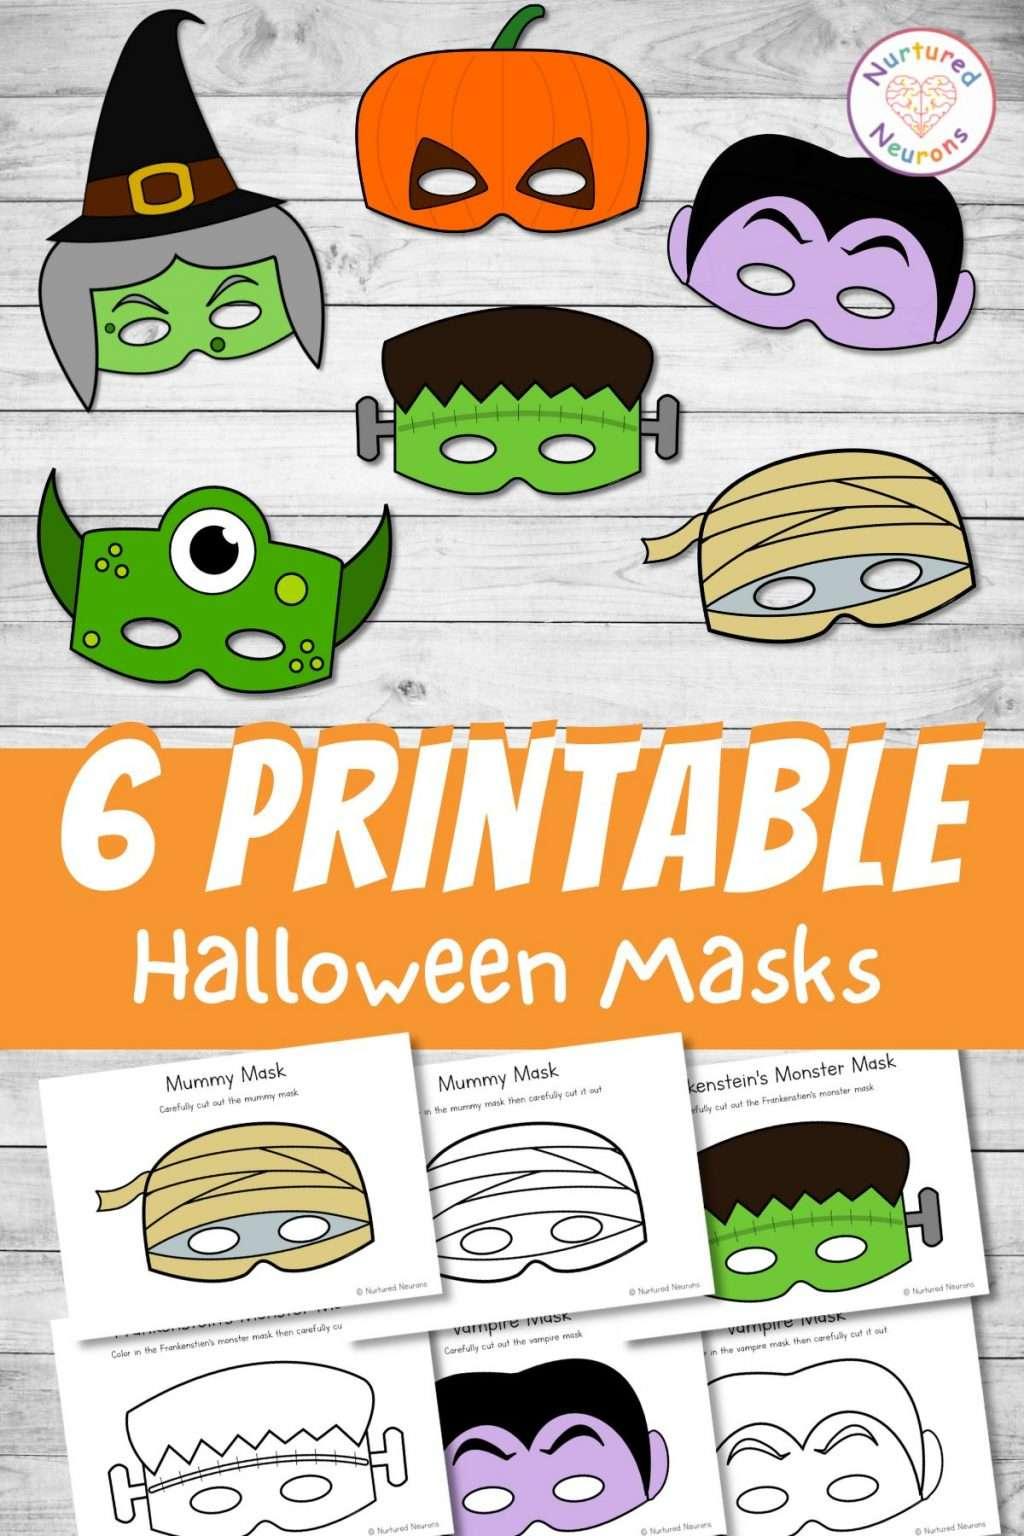 Printable Halloween Masks for kids - color and cut out mask crafts - vampire, Frankenstein, mummy, pumpkin, witch masks